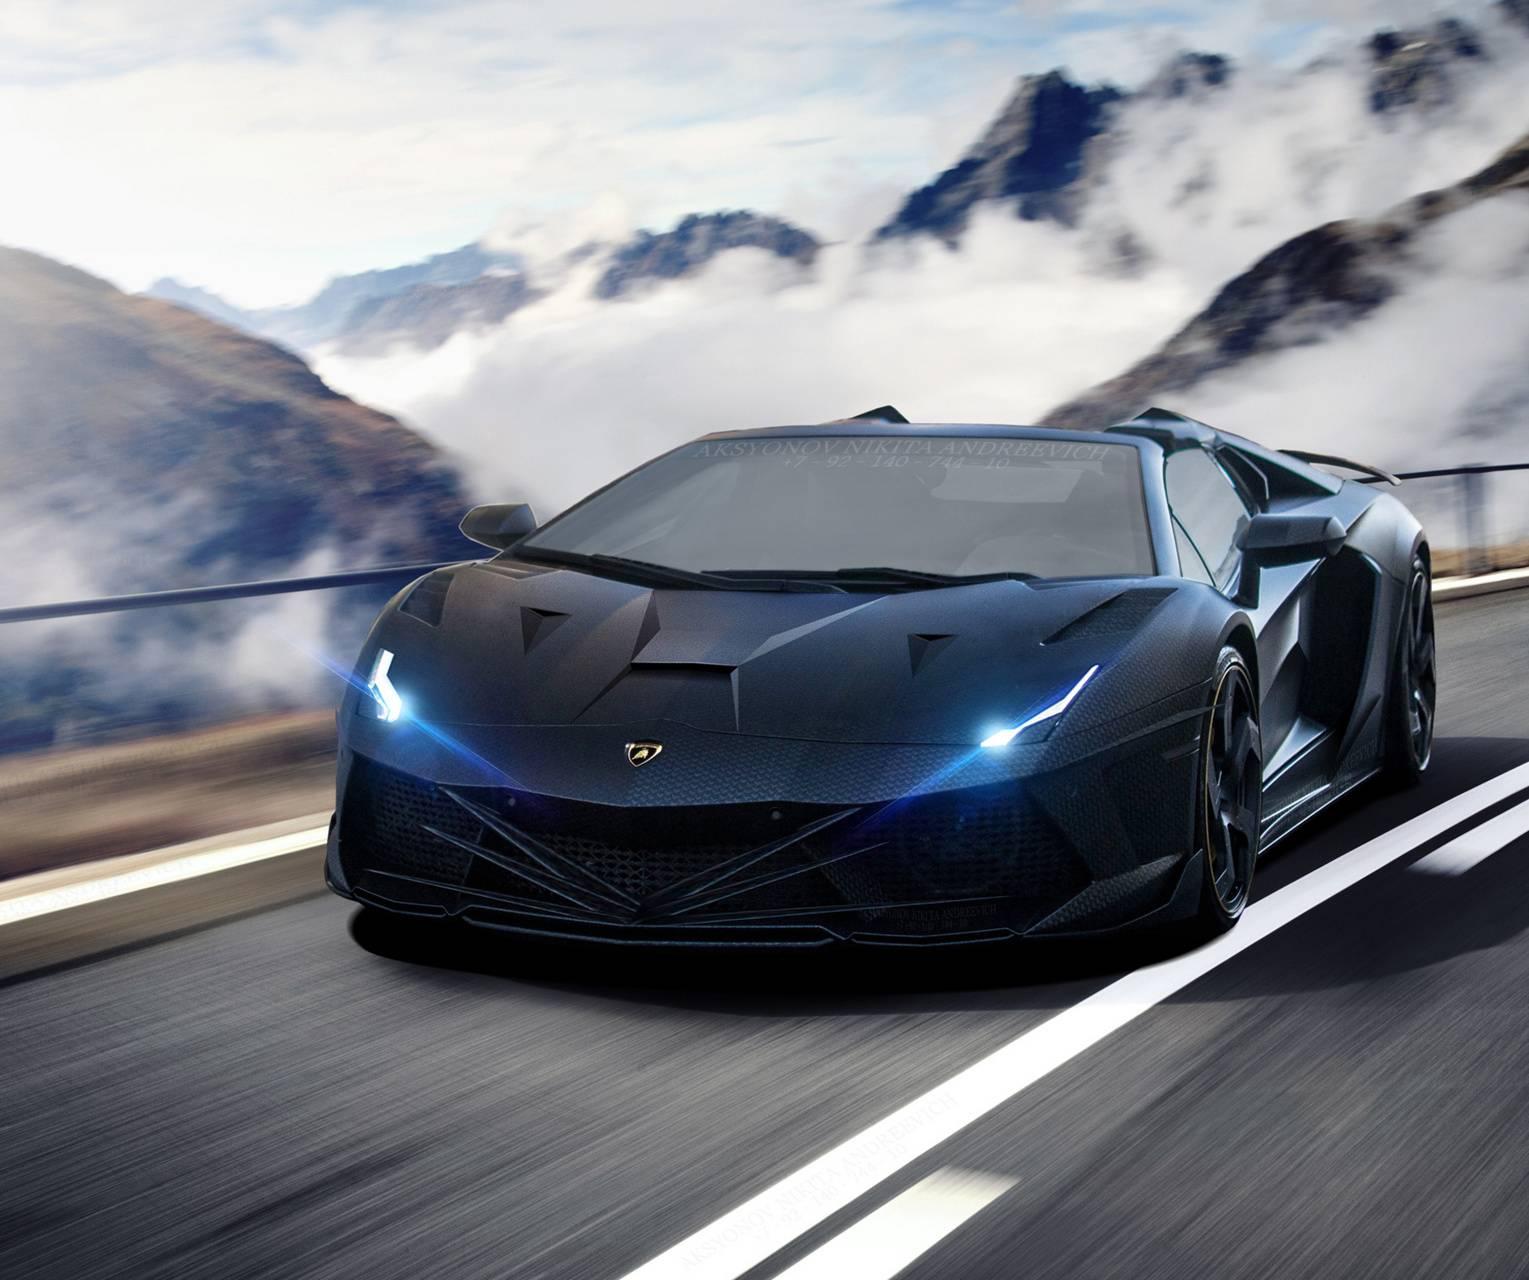 Lamborghini Aventadr